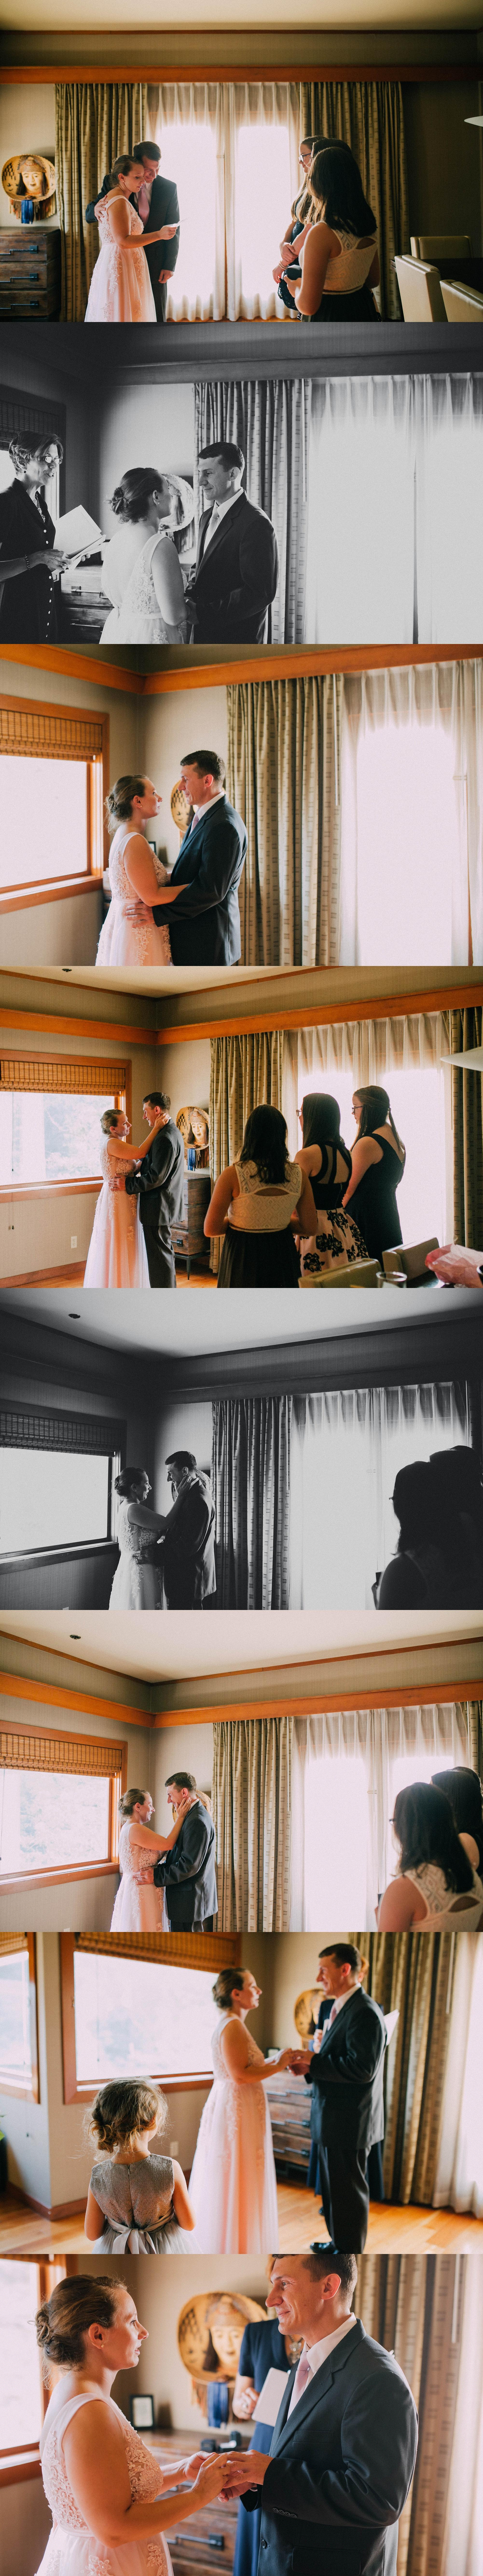 ashley_vos_seattle_ wedding_photographer_0483.jpg